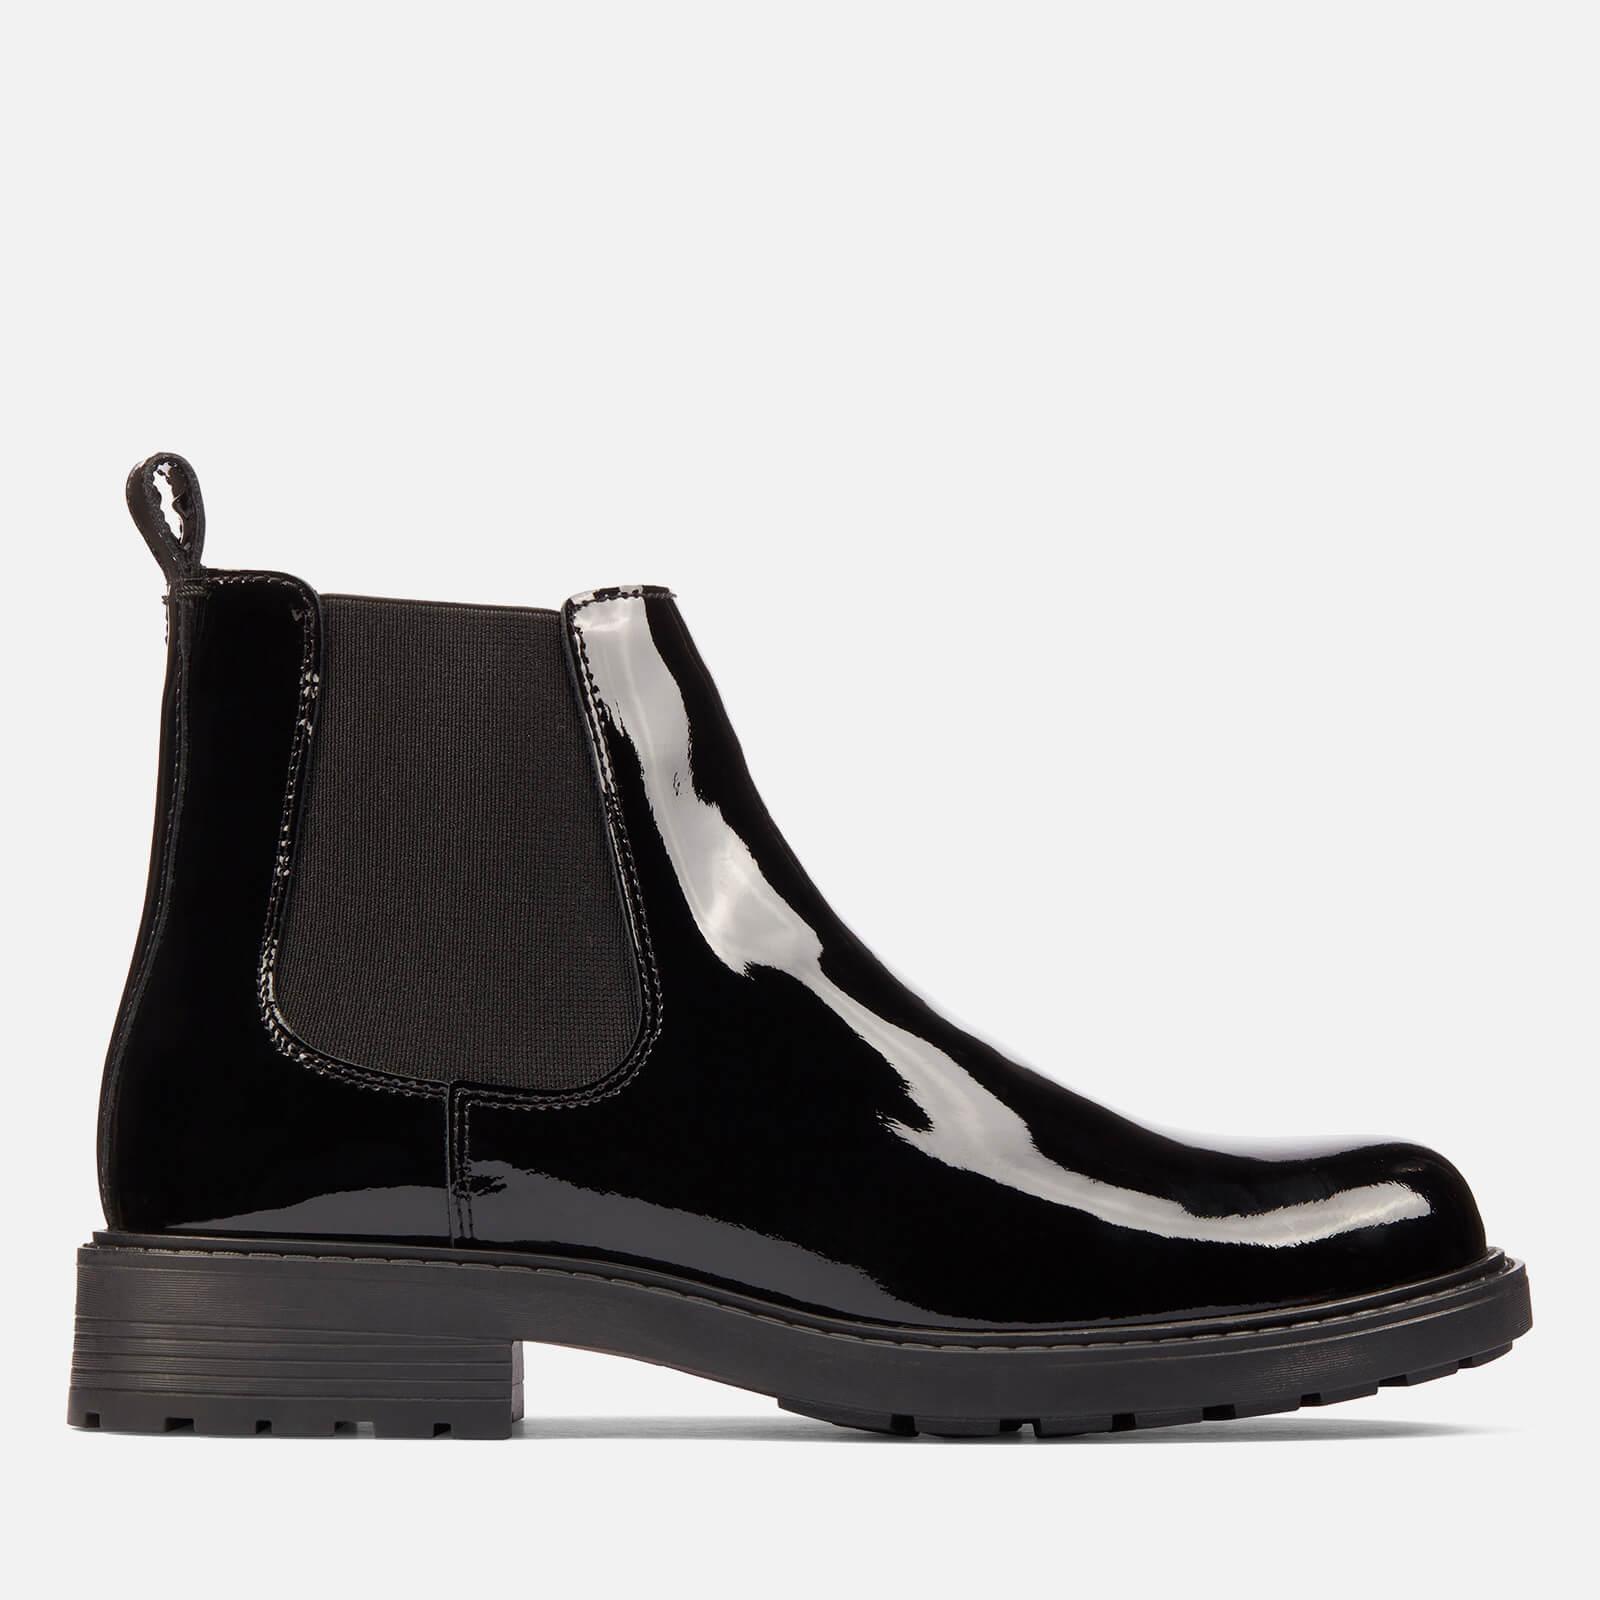 Clarks Women's Orinoco 2 Lane Patent Chelsea Boots - Black - Uk 3